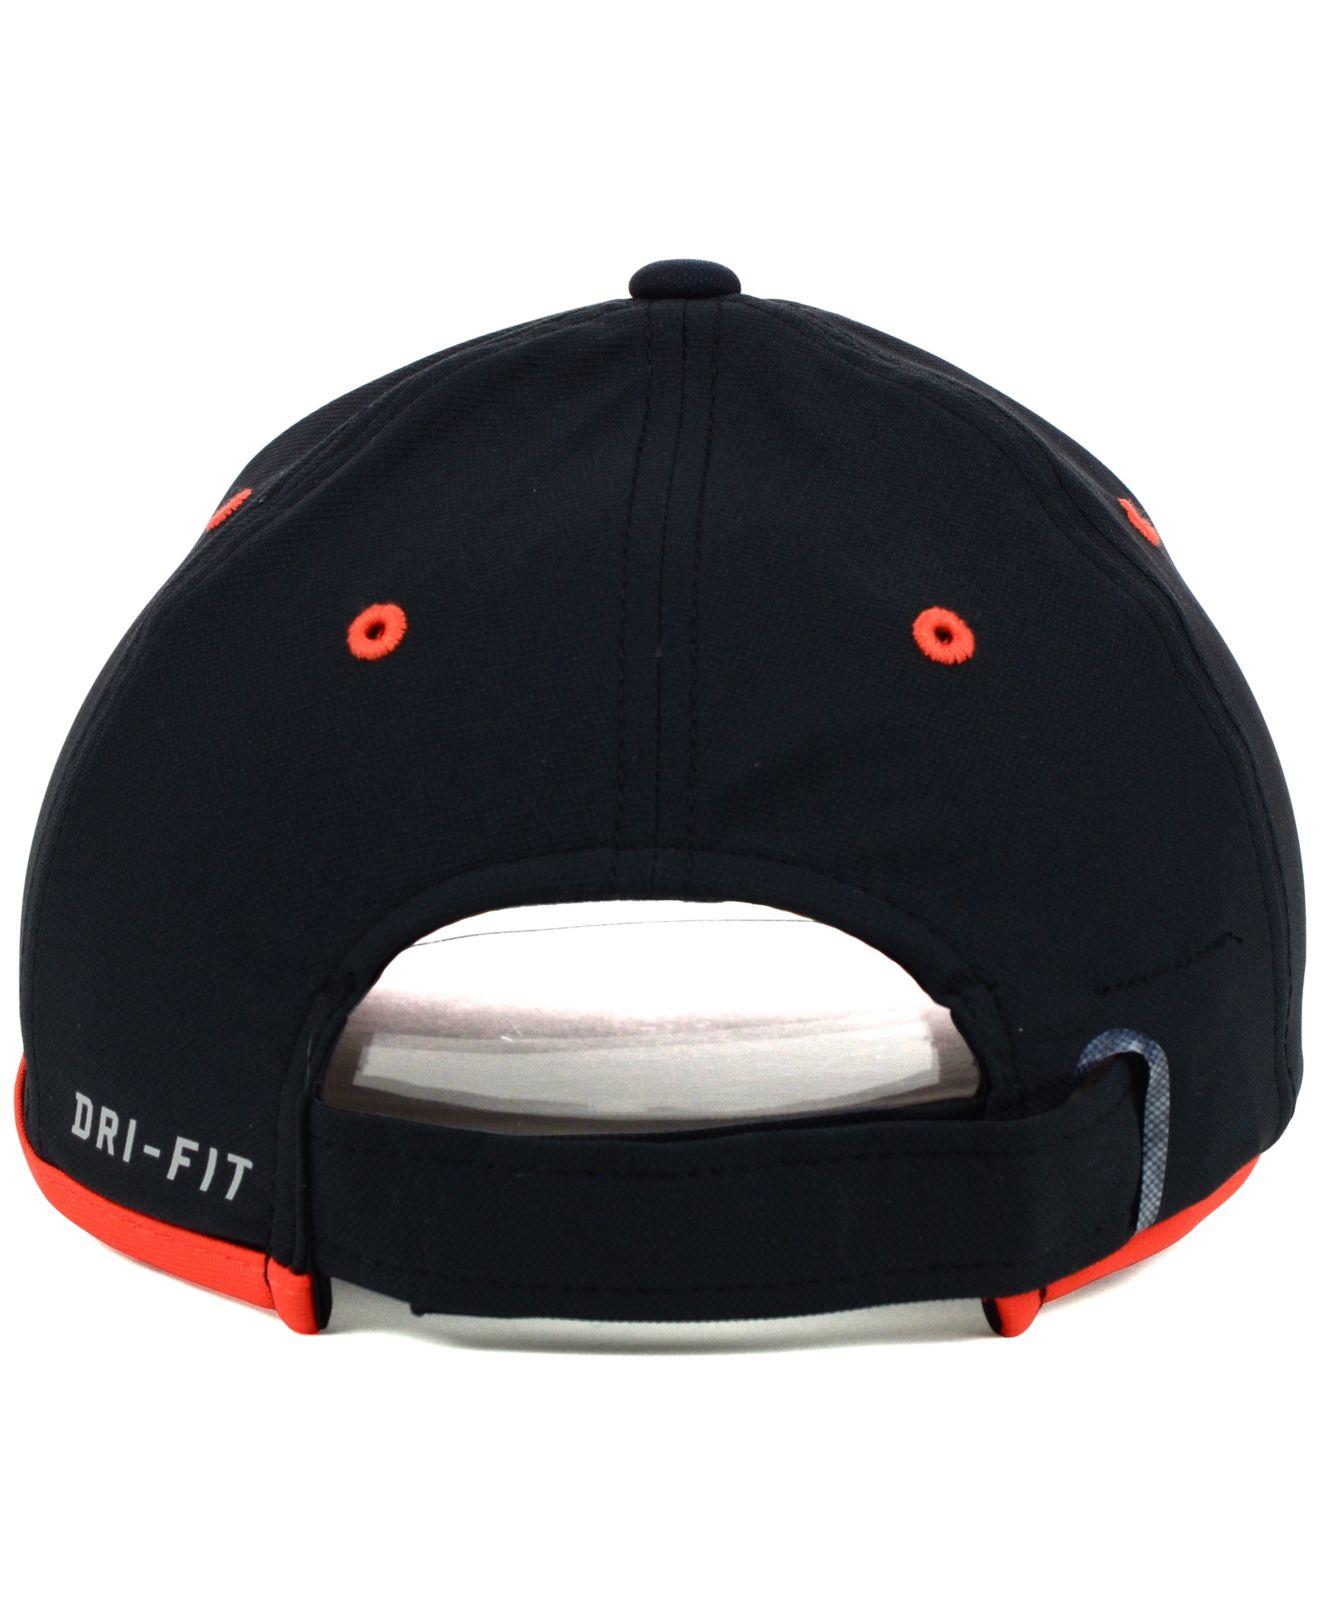 952481808b2 Lyst - Nike Oklahoma State Cowboys Coaches Dri-fit Cap in Black for Men